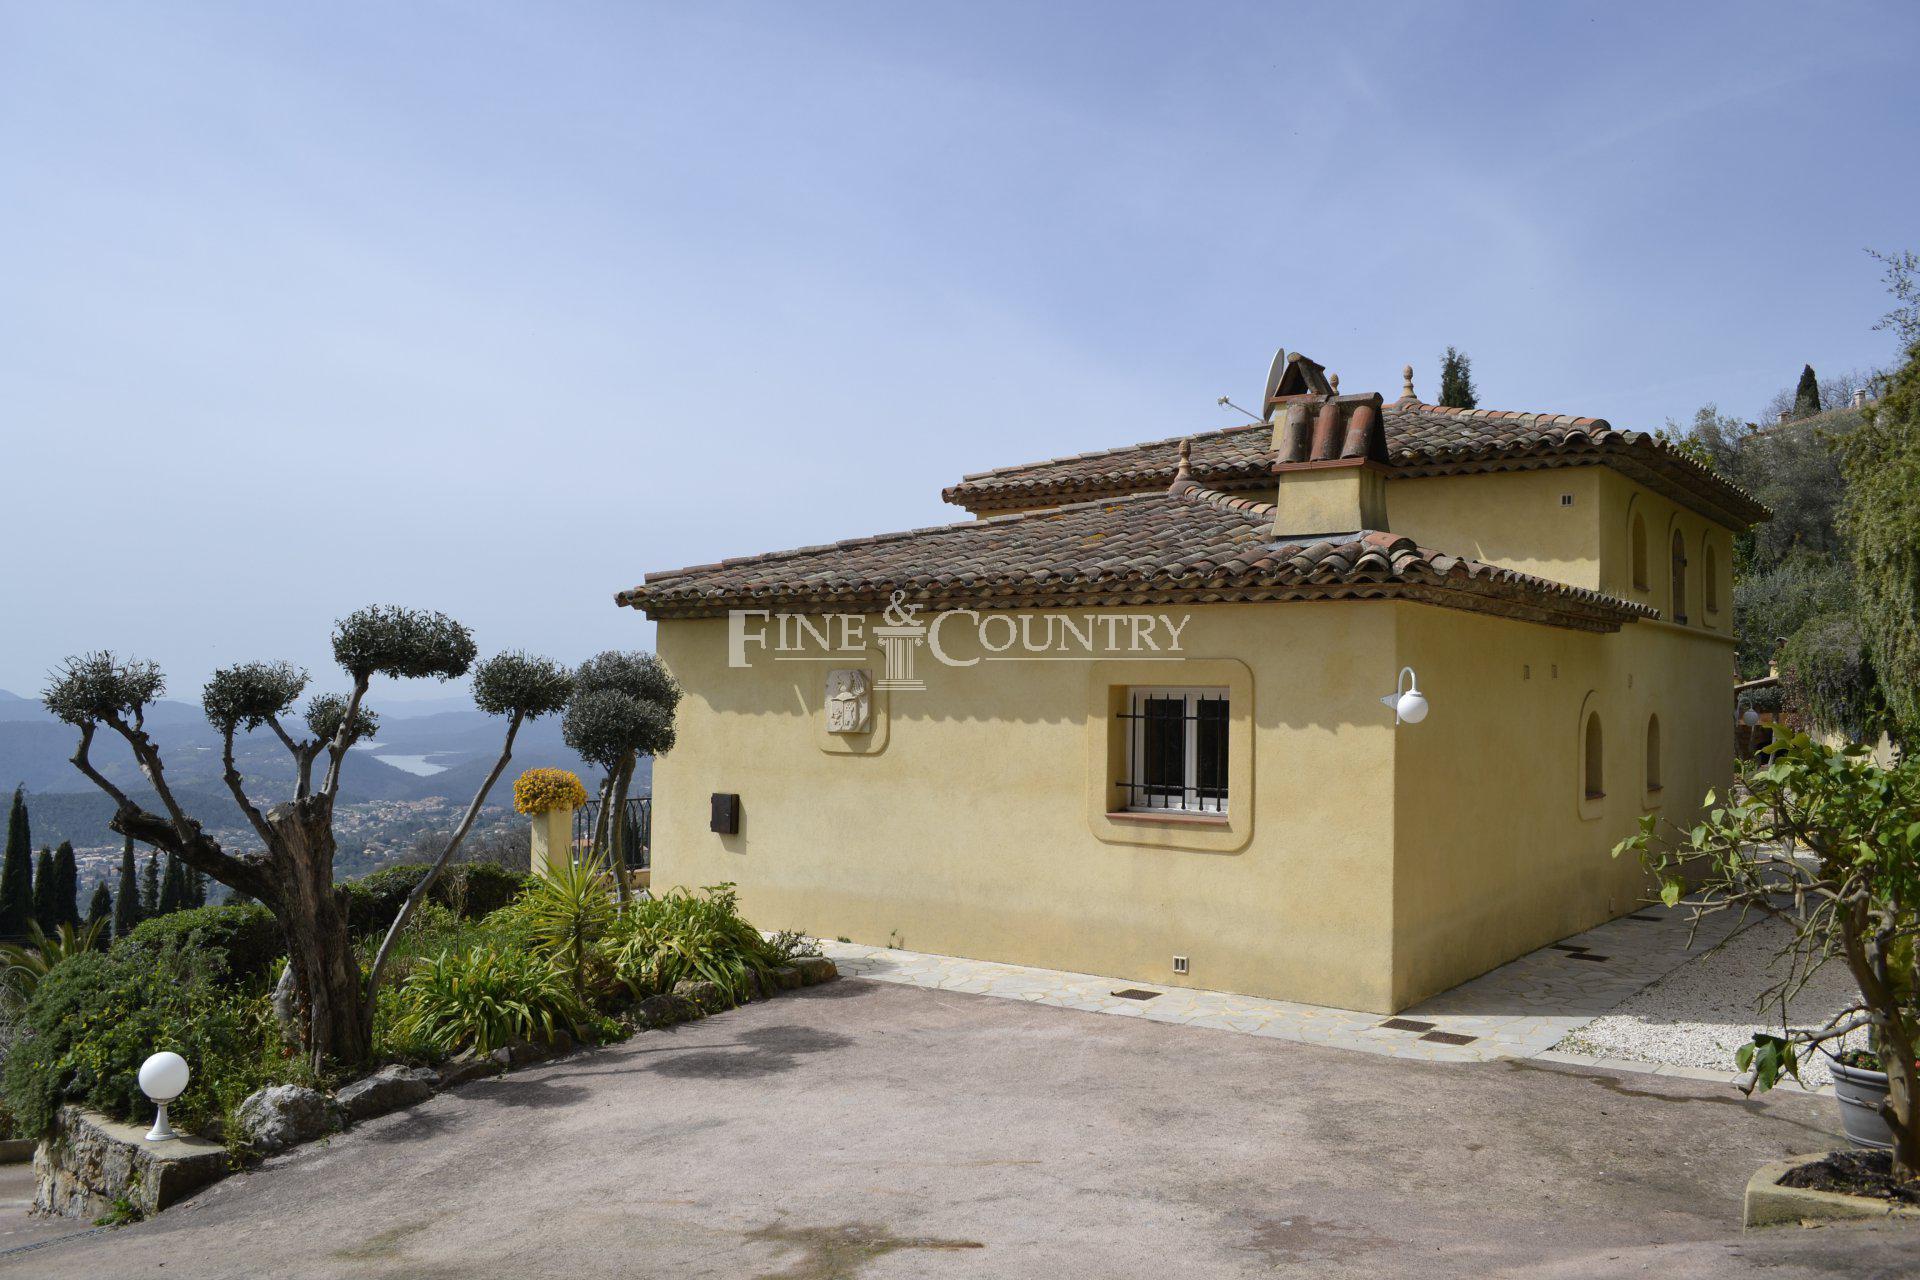 Villa for sale, close to Cabris, land 1850m2, 3 car shelters